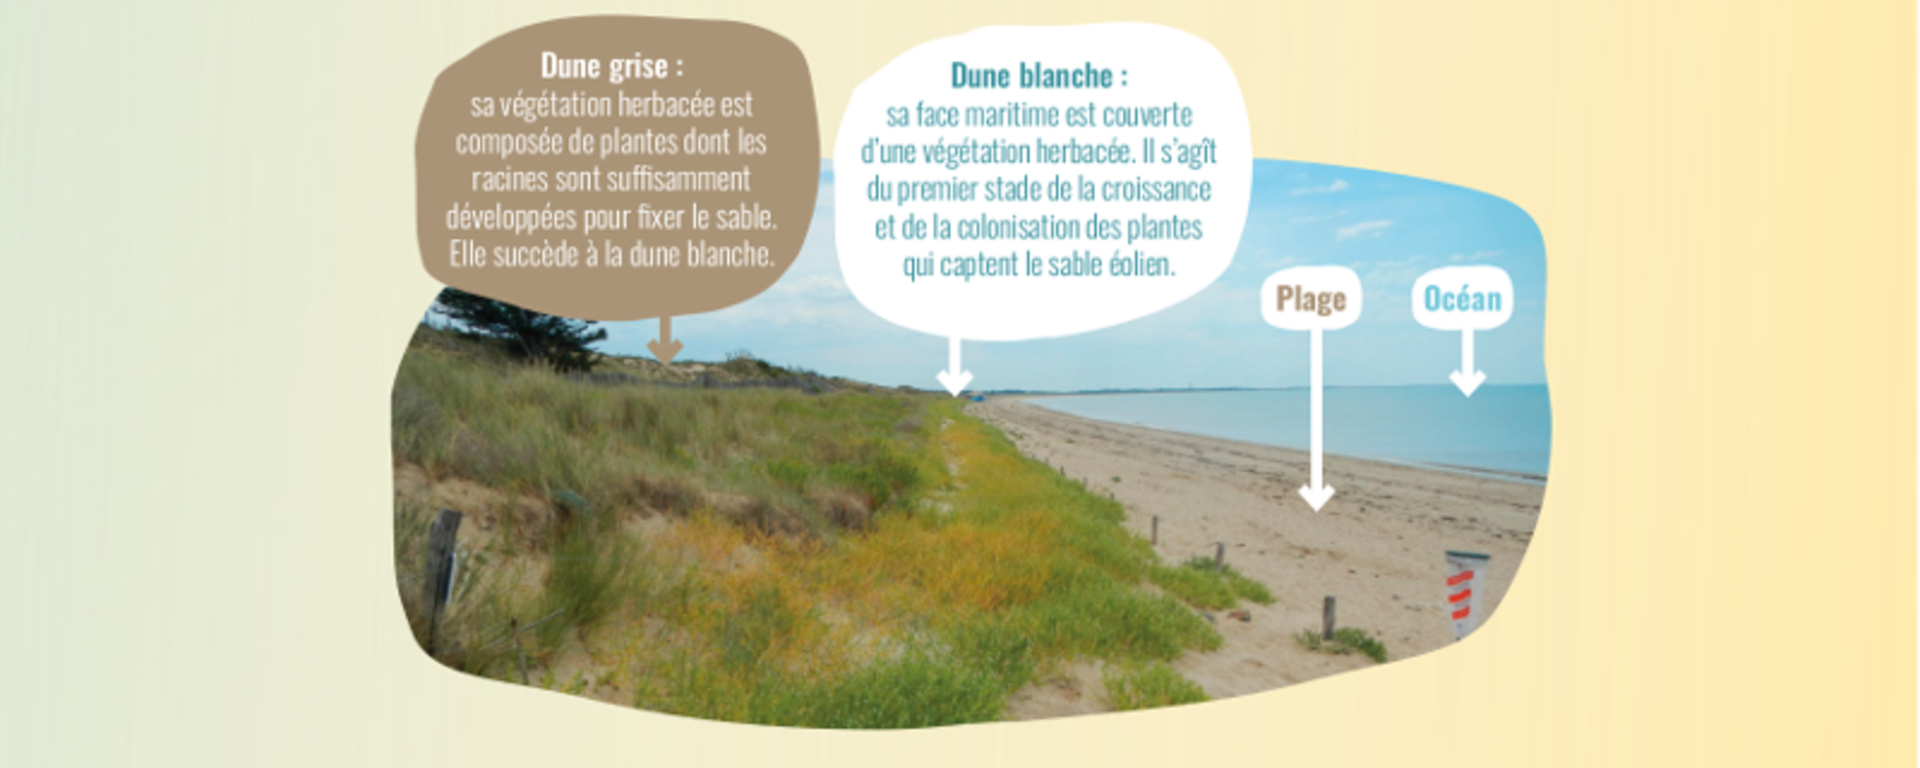 Dune grise et dune blanche